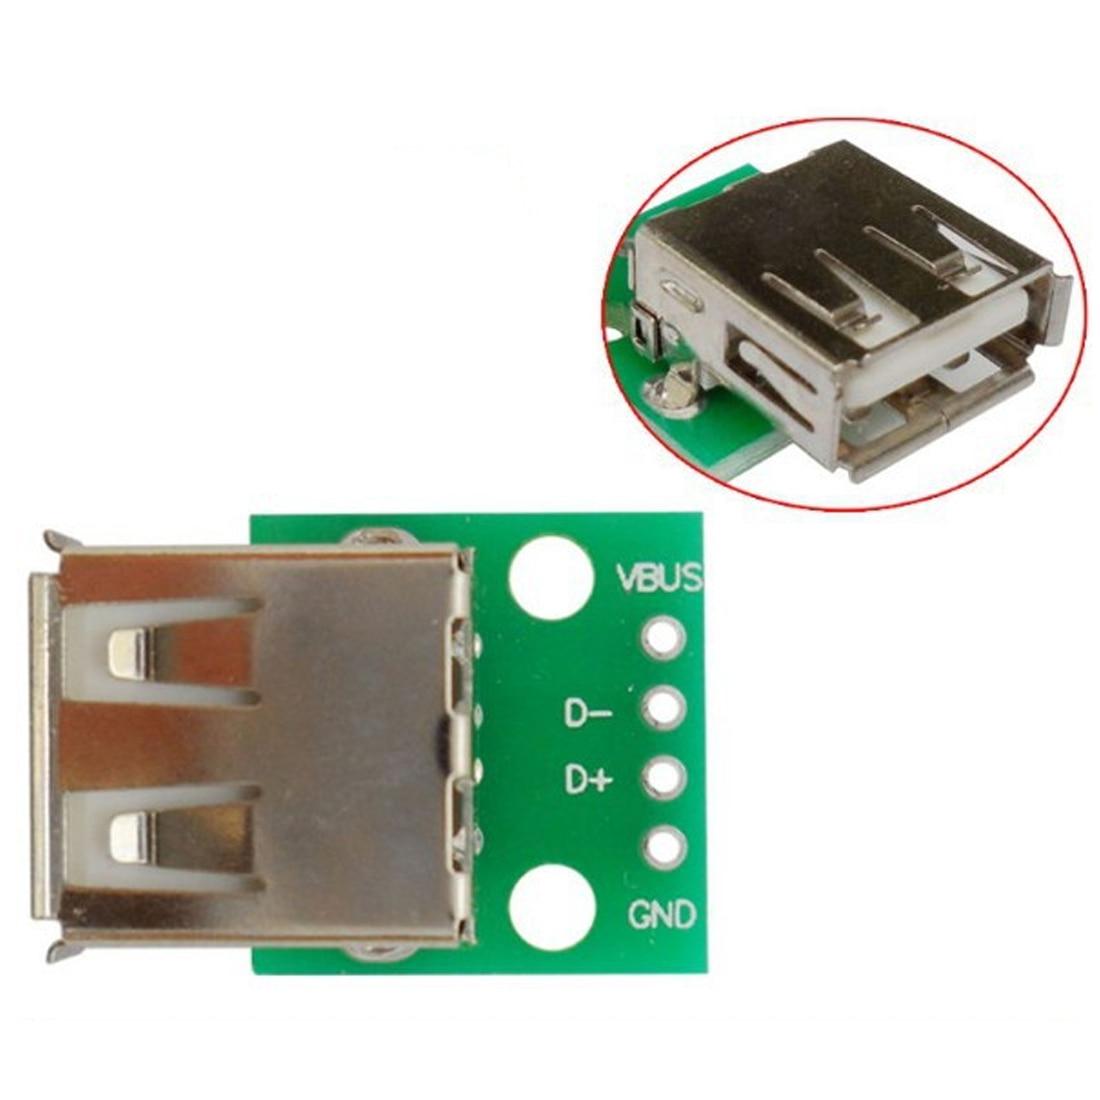 10pcs Mini Micro Usb To Dip 254mm Adapter Connector Module Board Db9 Wiring Diagram Panel Female 4